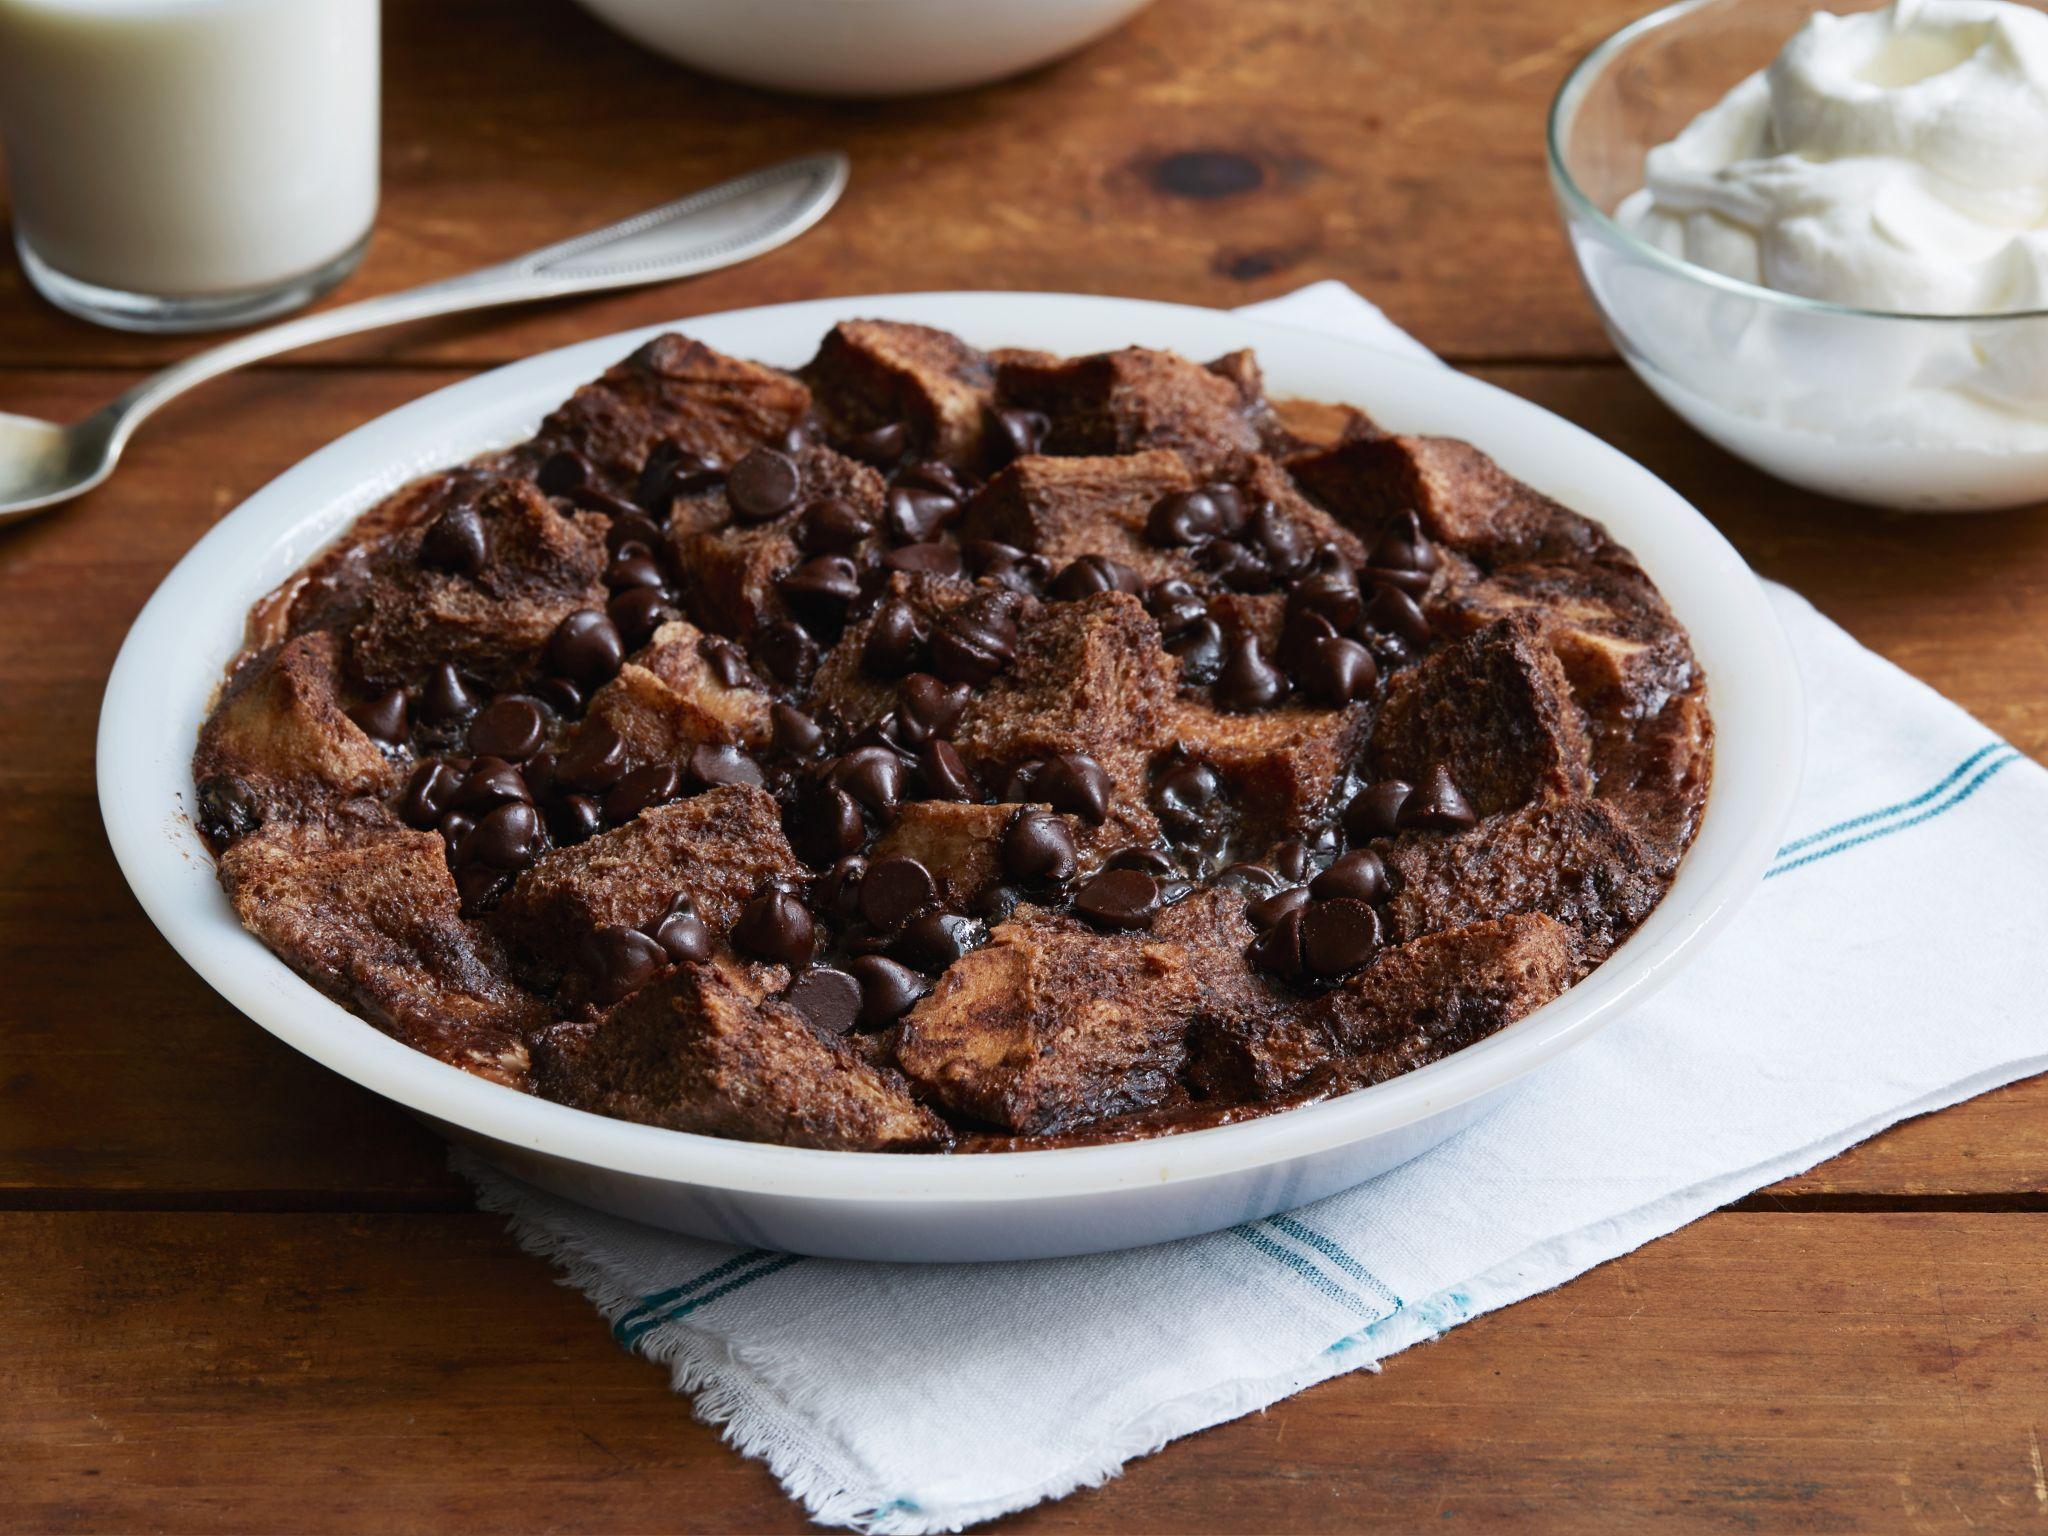 Chocolate bread pudding receta chocolate bread pudding chocolate bread pudding recipe from food network forumfinder Choice Image